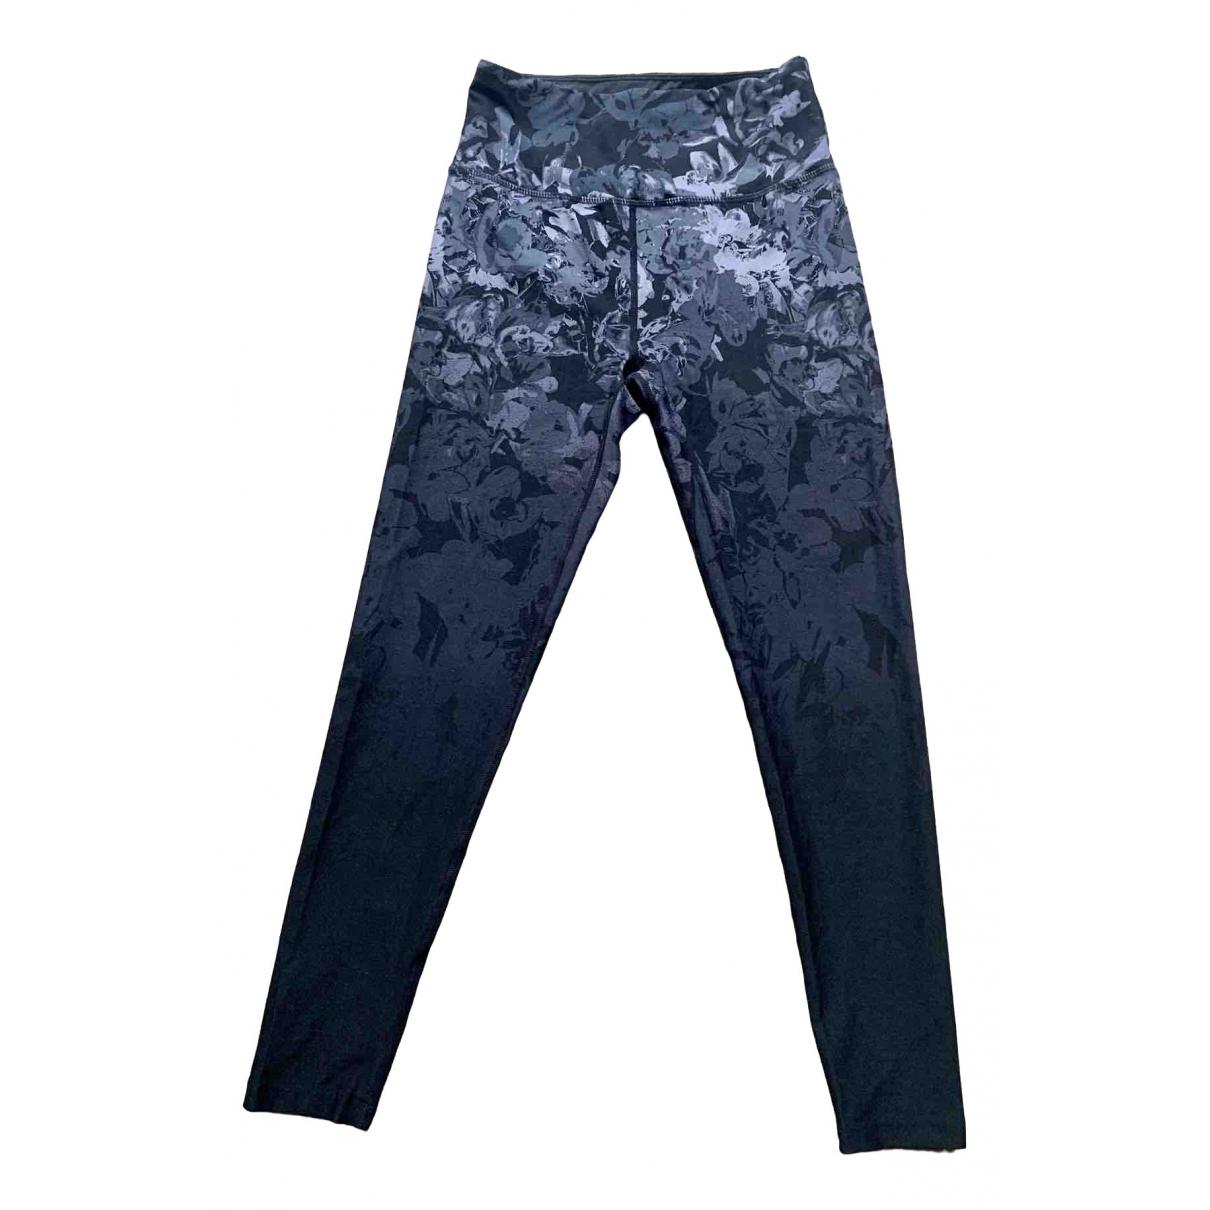 Calvin Klein \N Trousers for Women XS International